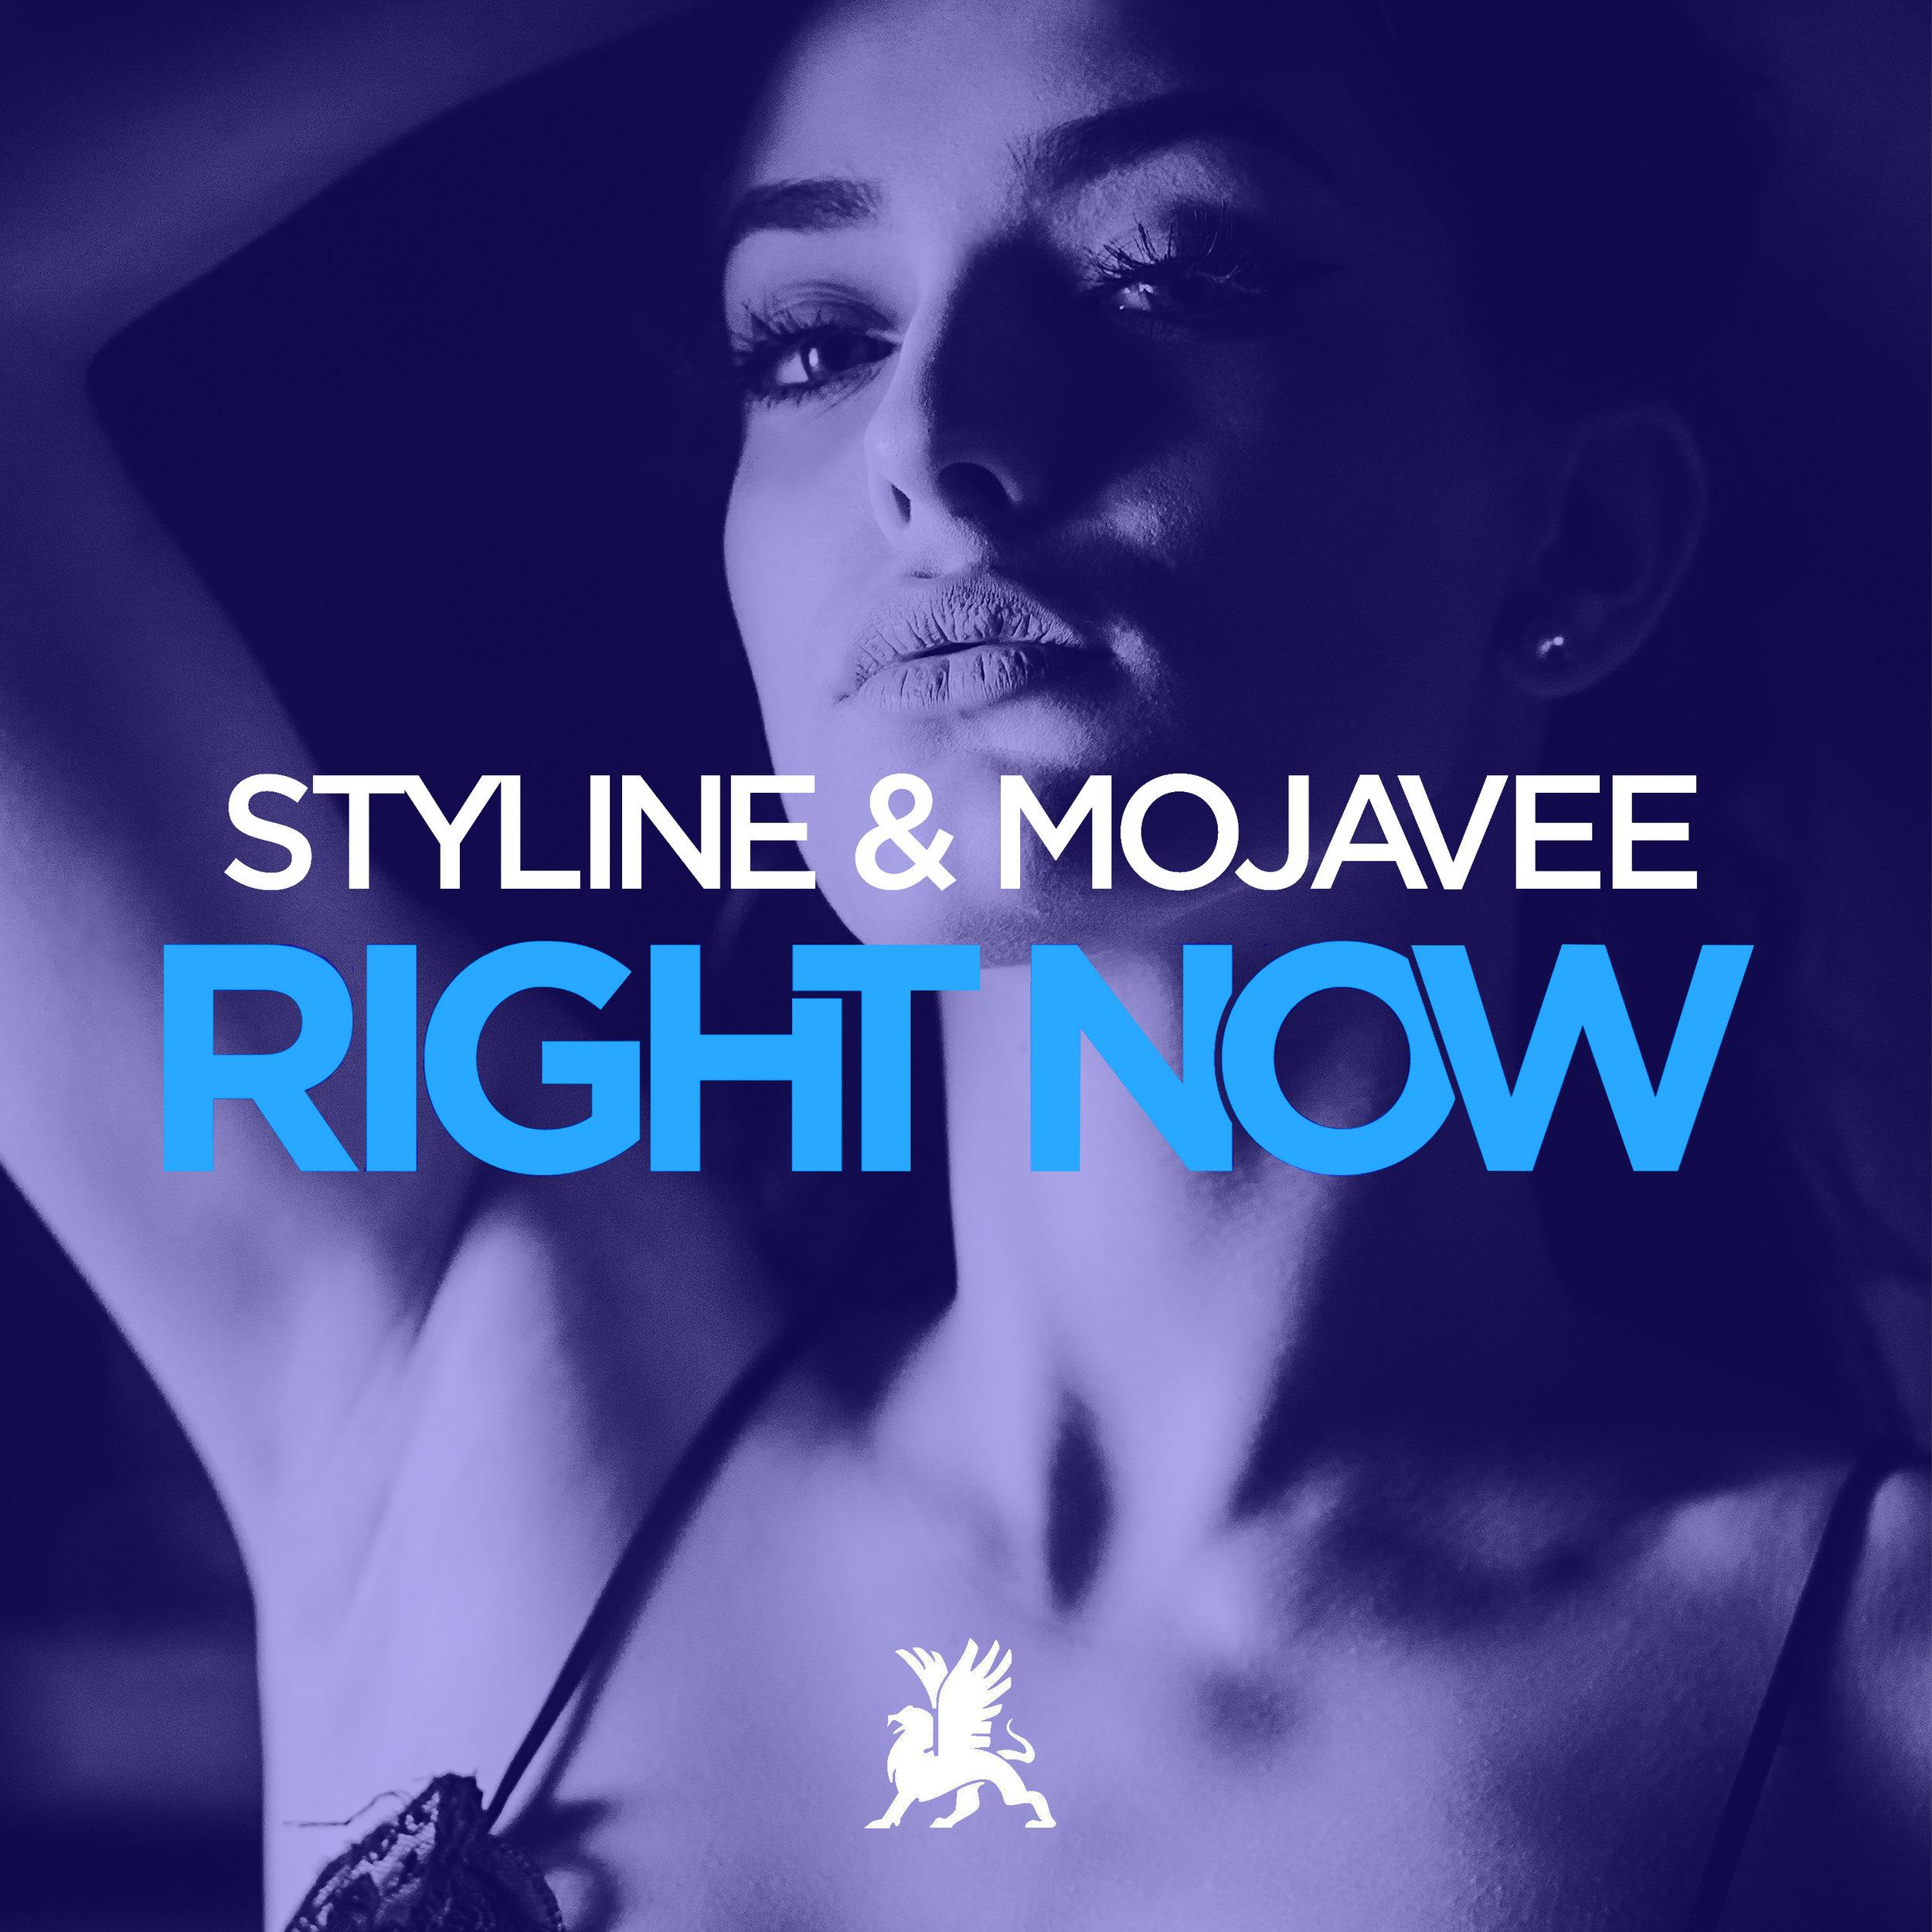 Styline & Mojavee - Right Now.jpg